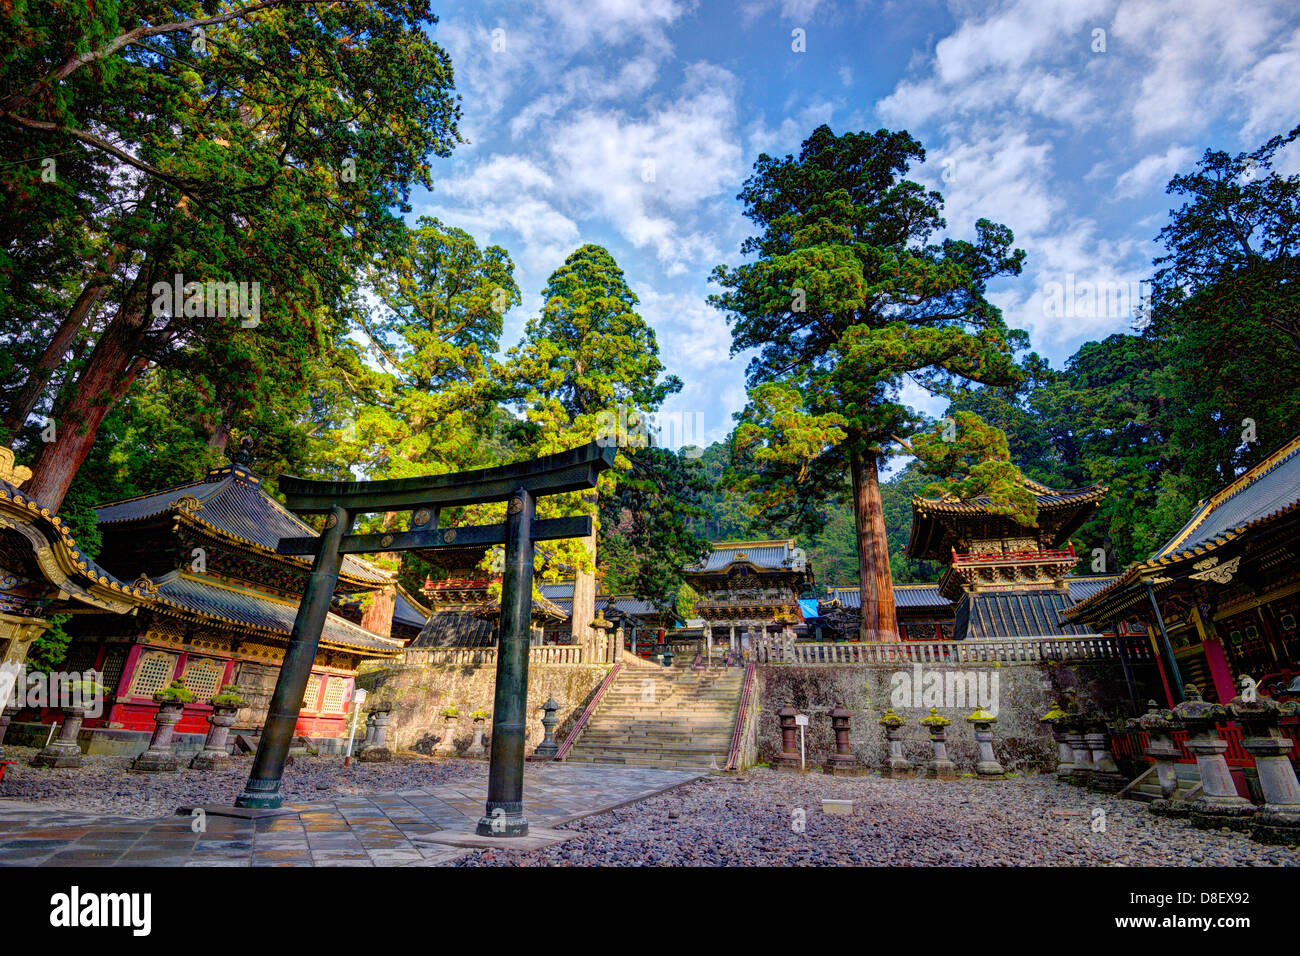 Toshogu Shrine grounds in Nikko, Japan, sight of the tomb of the last Shogunate Tokugawa Ieyasu. - Stock Image